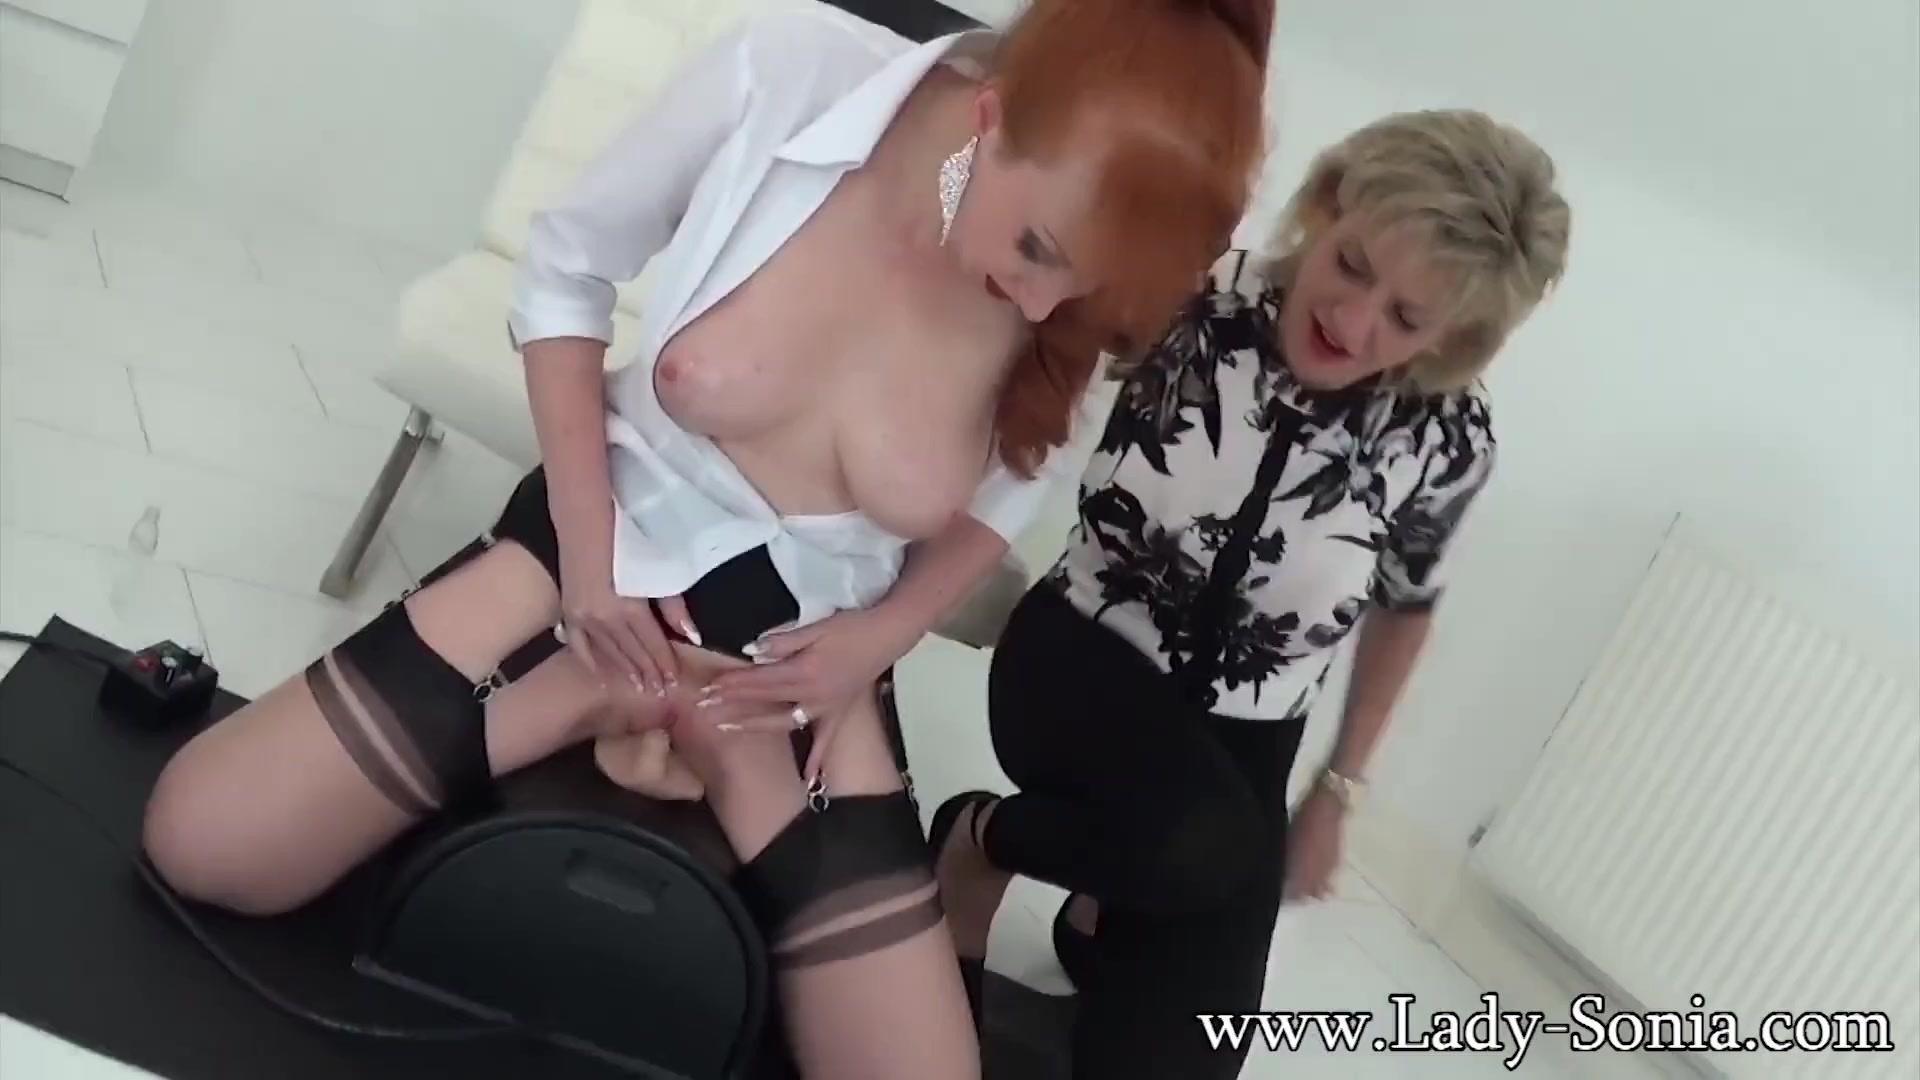 Lady Sonya Masturbation Videos